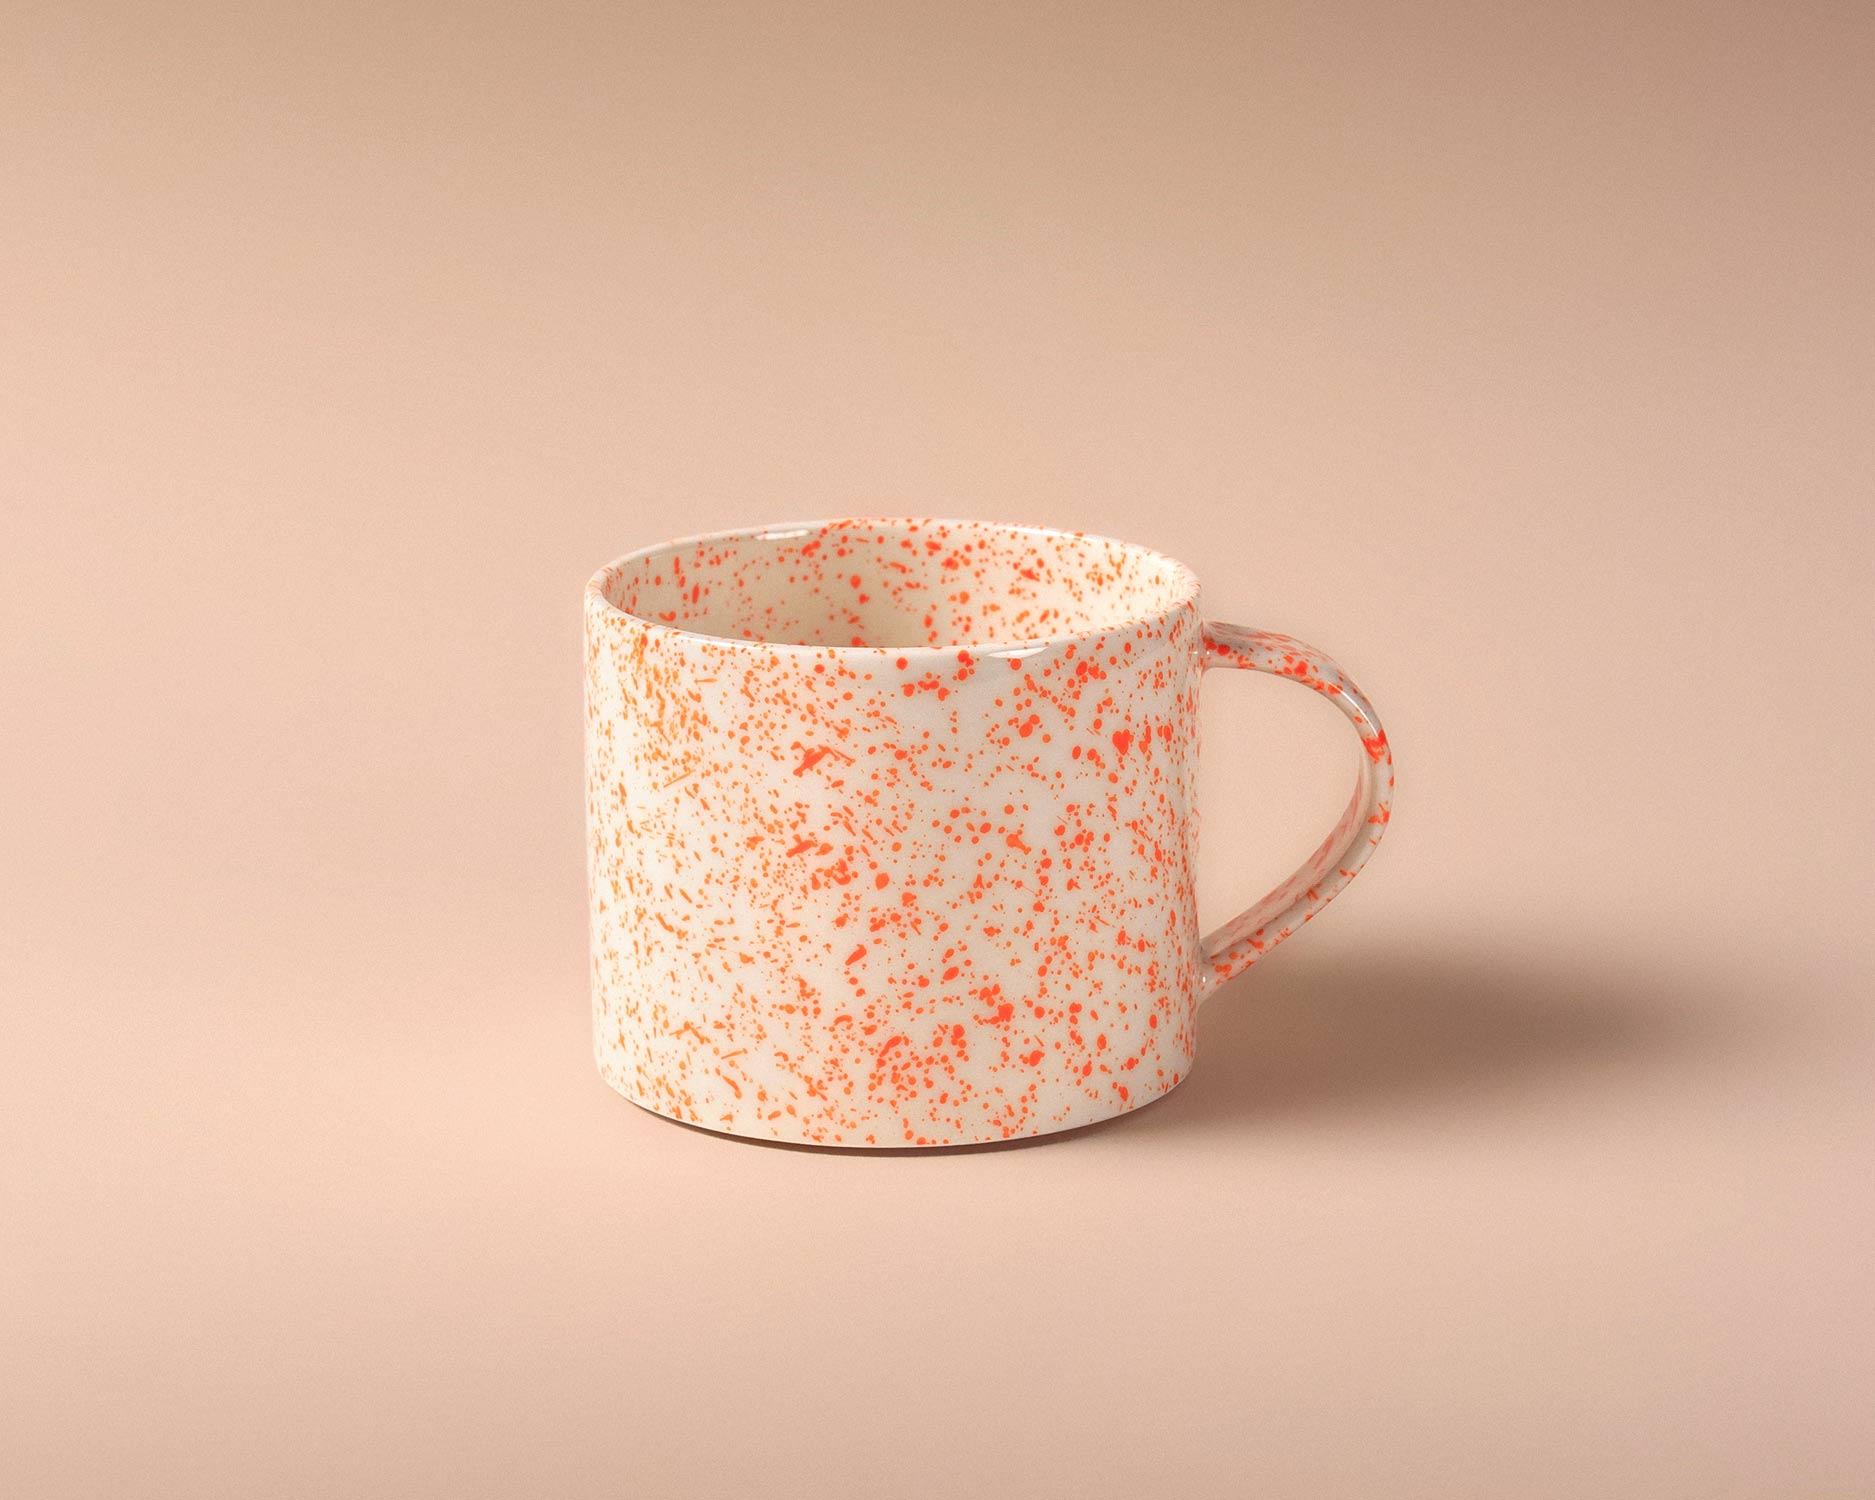 nebolusa-tea-cup-orange-2-pp.jpg